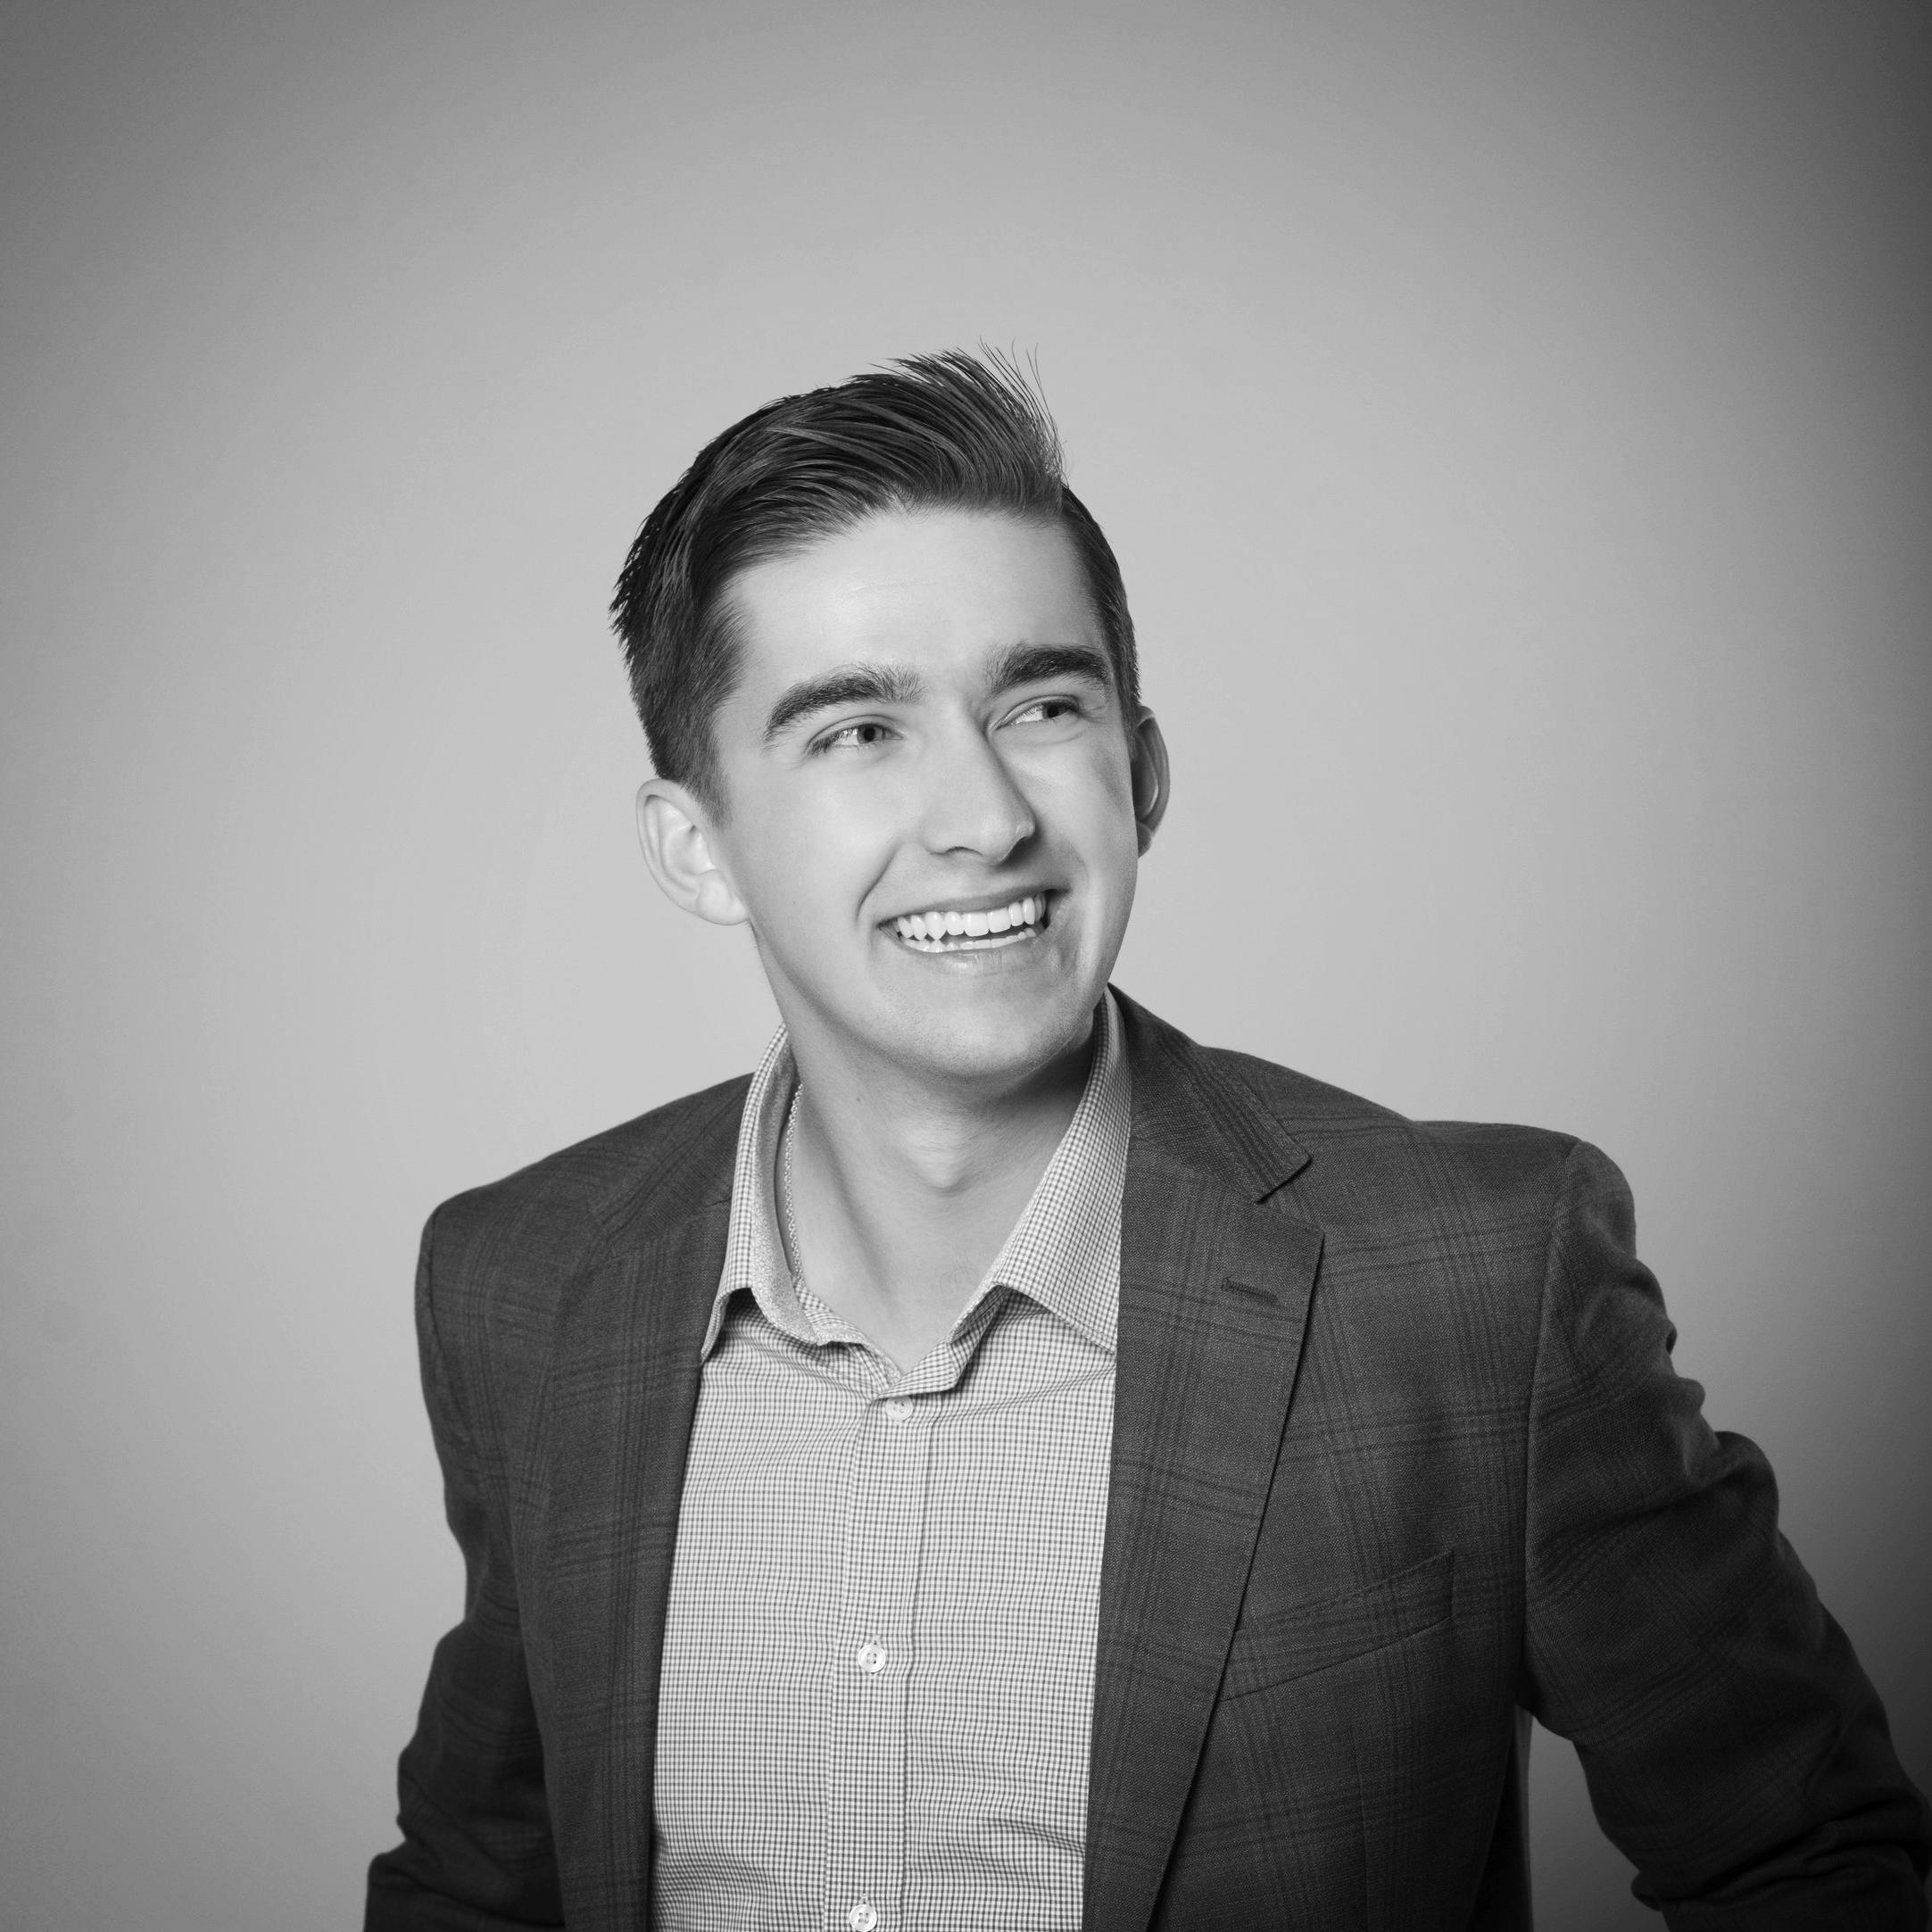 Greg Trinkl - Business Associate